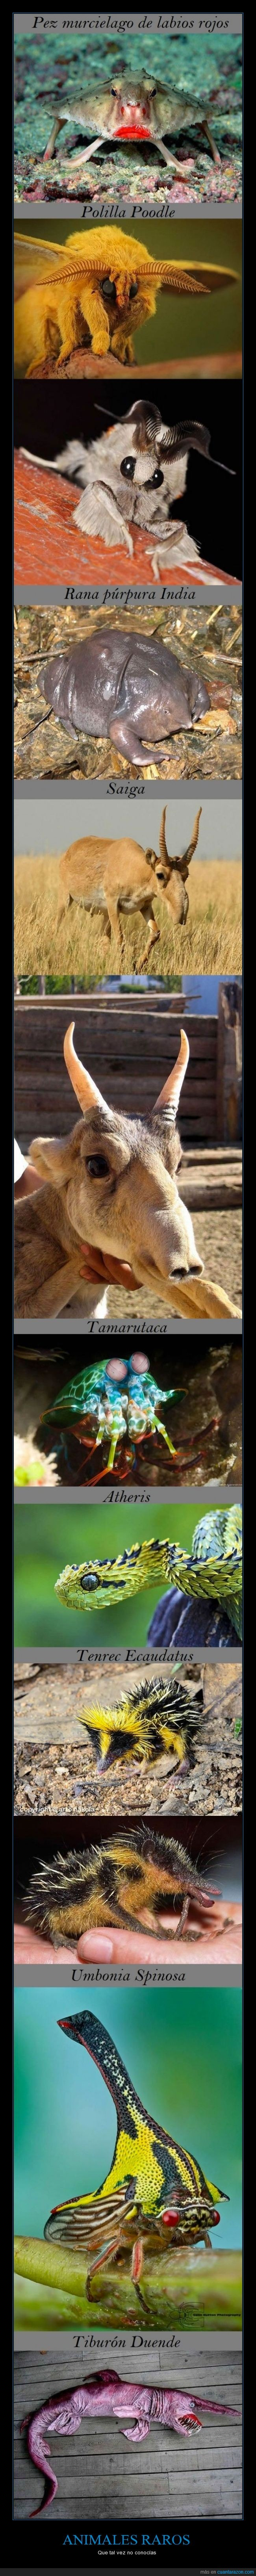 animales,duende,erizo,labios,rana,raros,saiga,serpiente,tiburon